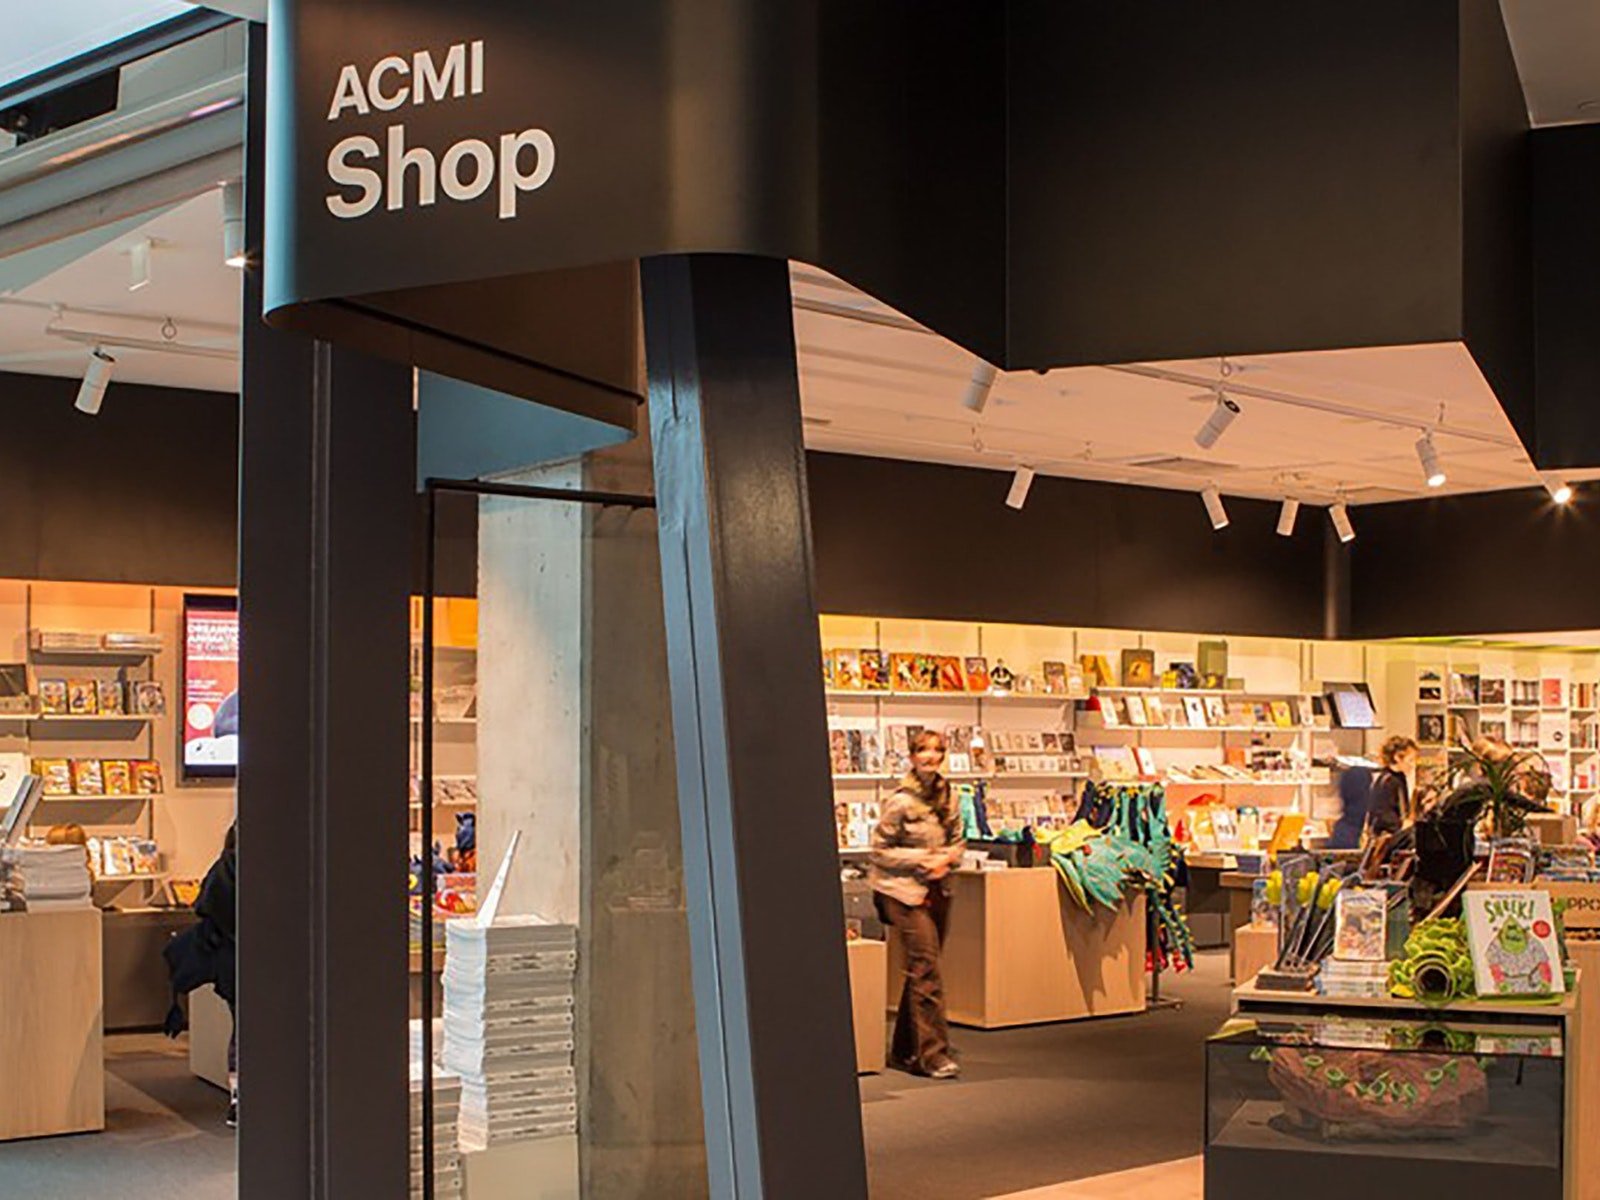 ACMI Shop